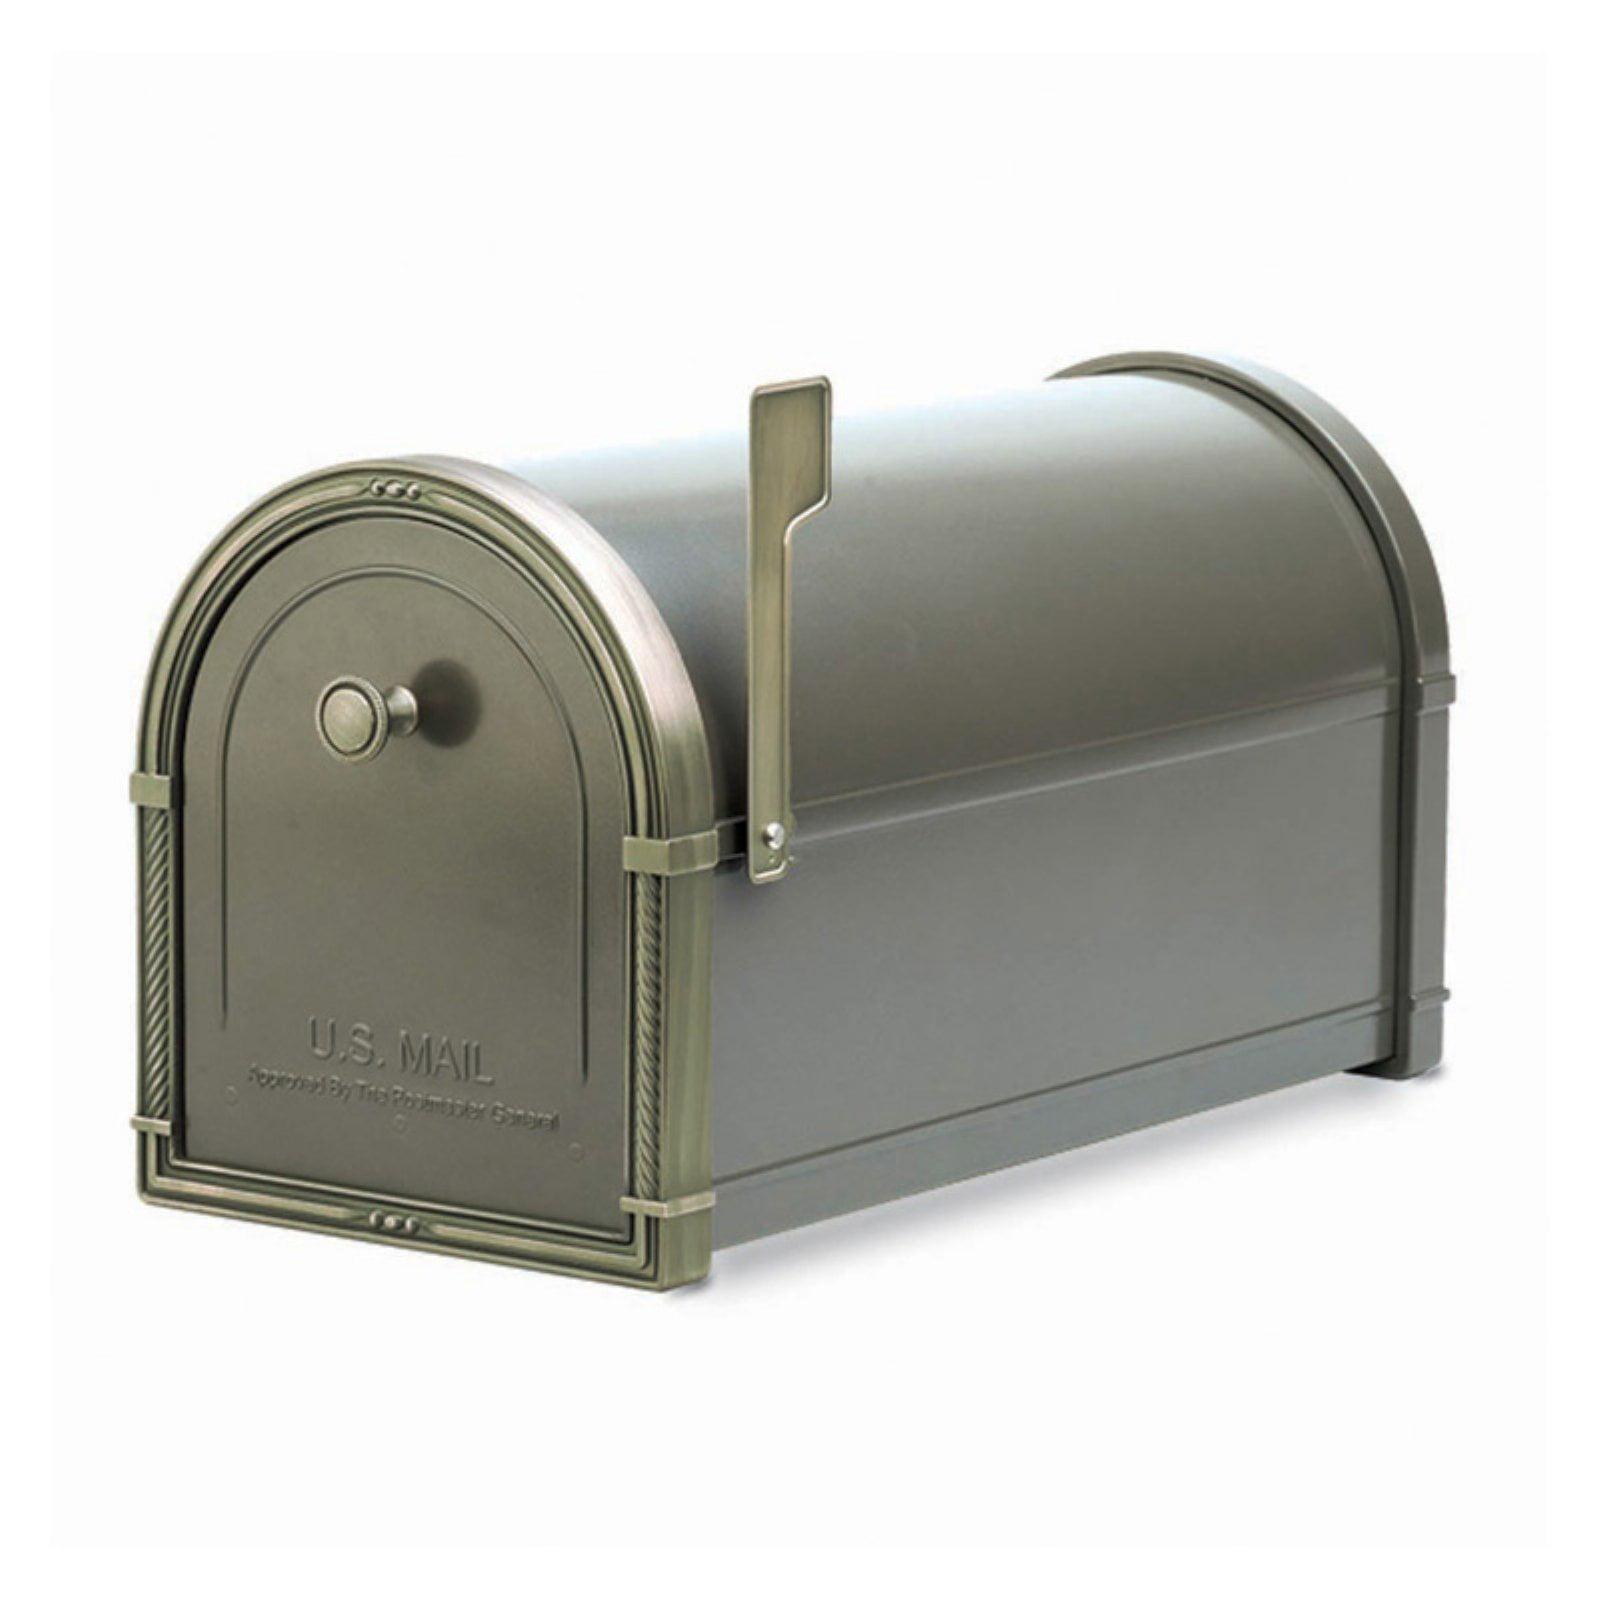 Picture of: Architectural Mailboxes Coronado Mailbox Black With Antique Bronze Accents Walmart Com Walmart Com